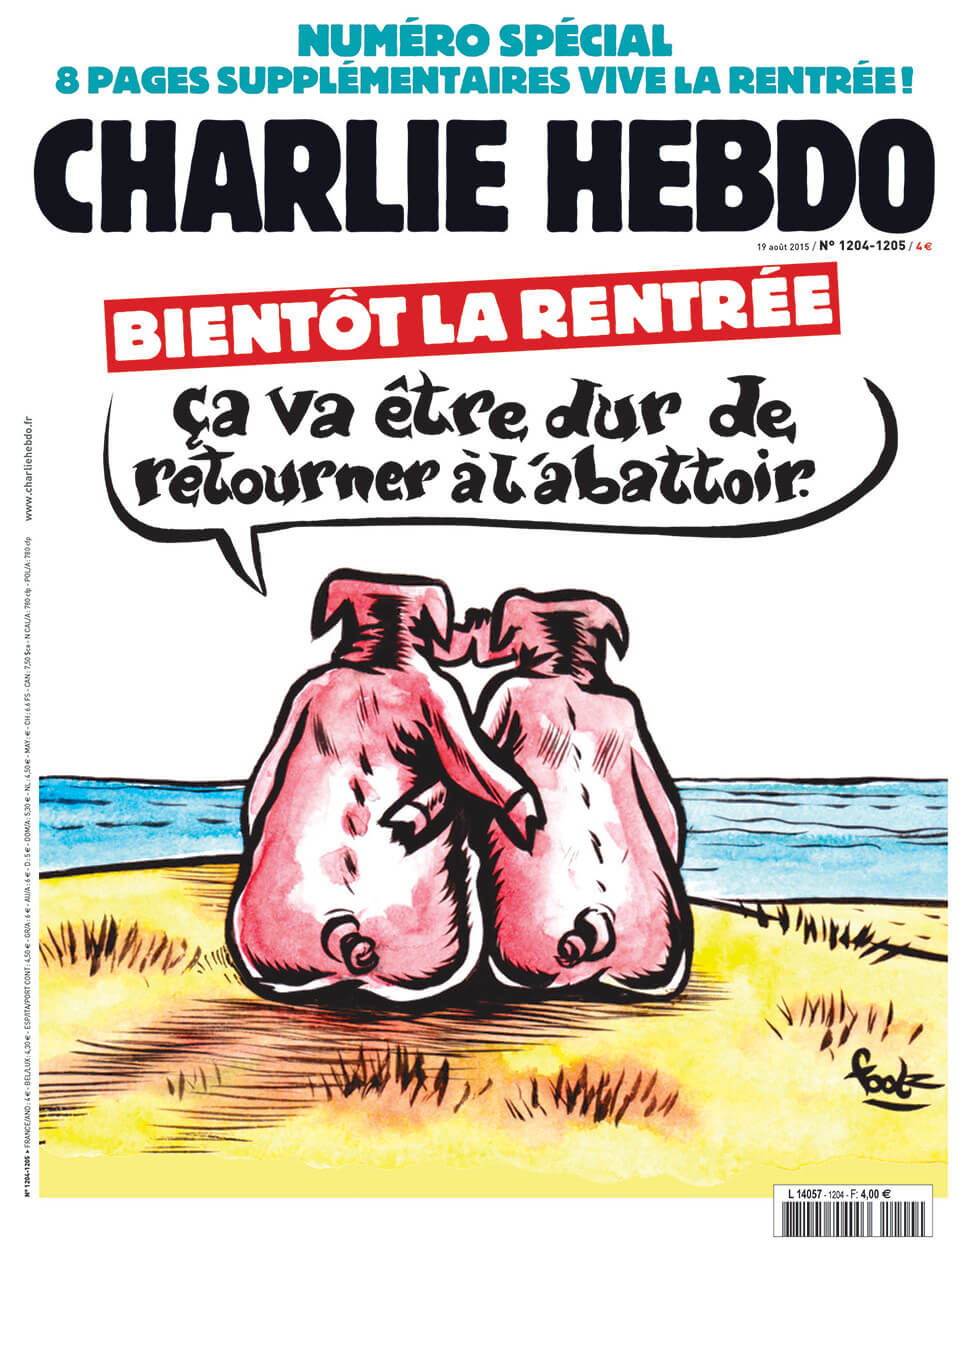 Charlie Hebdo n°1204-1205 --- 18 août 2015